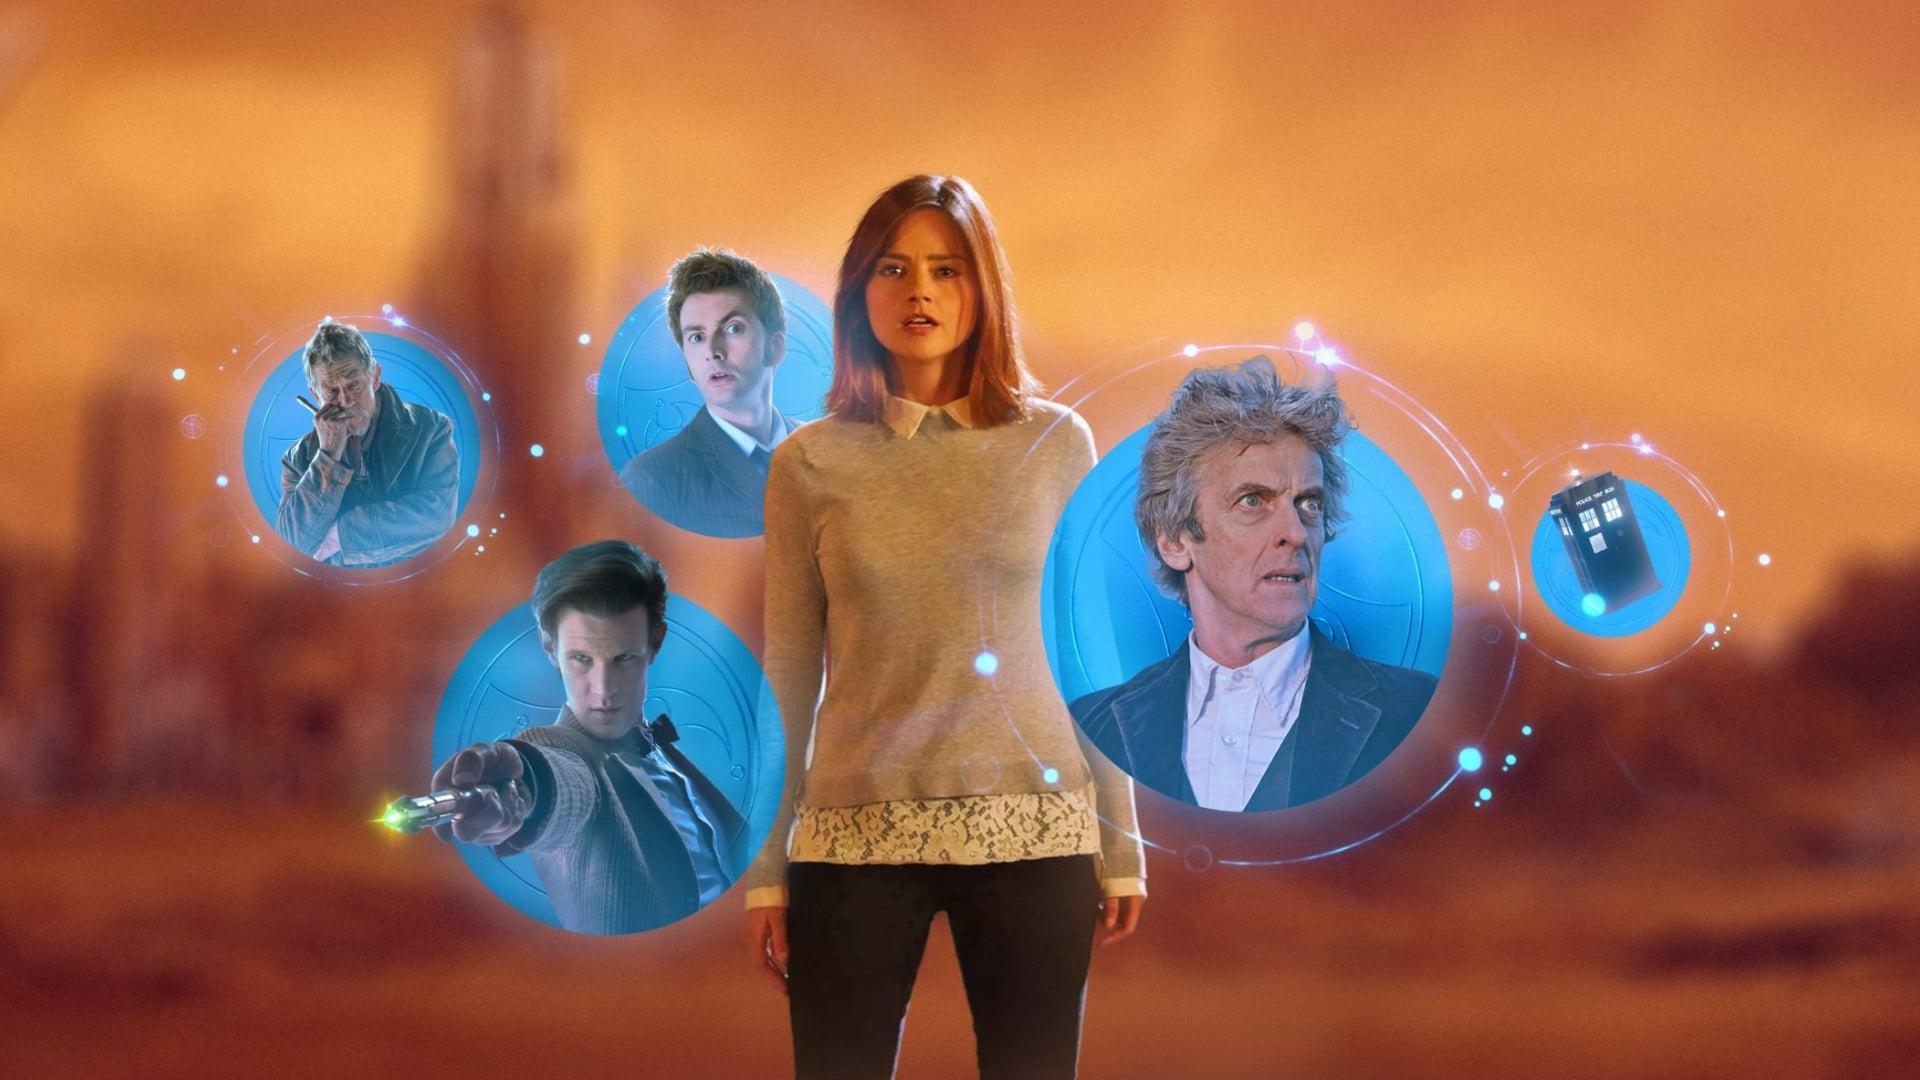 Doctor Who - Season 12 Episode 4 Nikola Tesla's Night of Terror